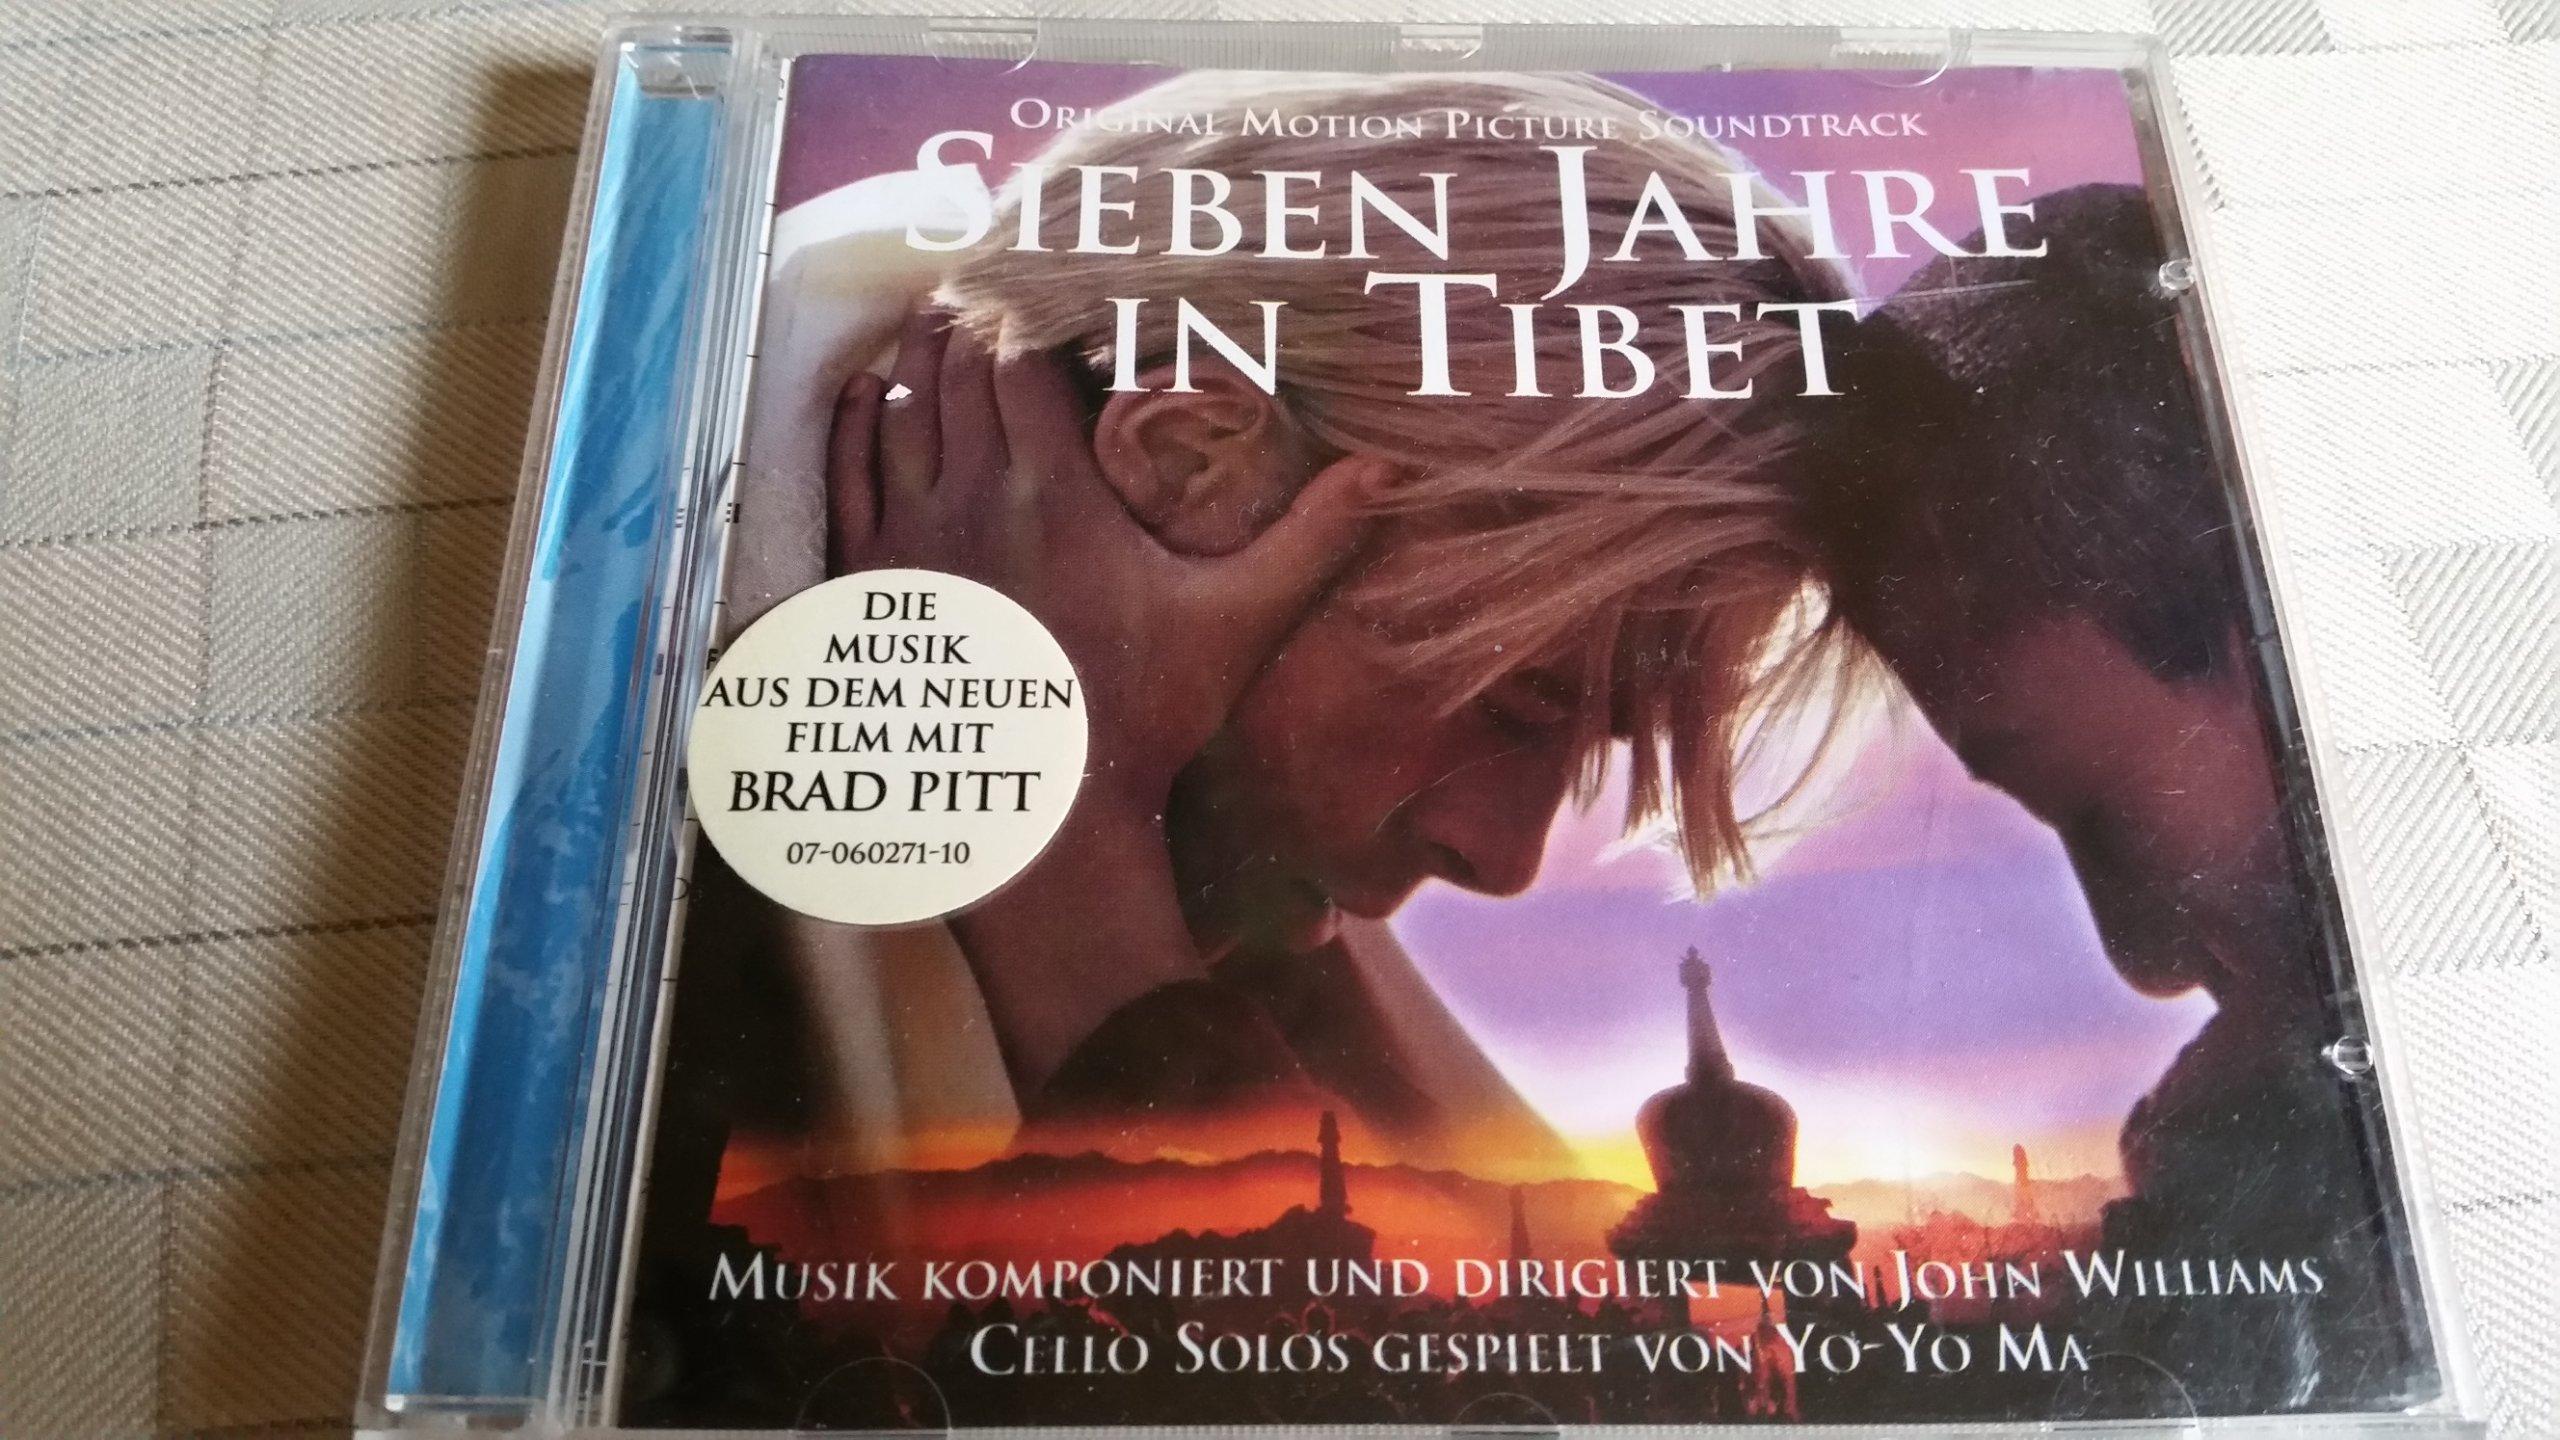 7 lat w tybecie online dating